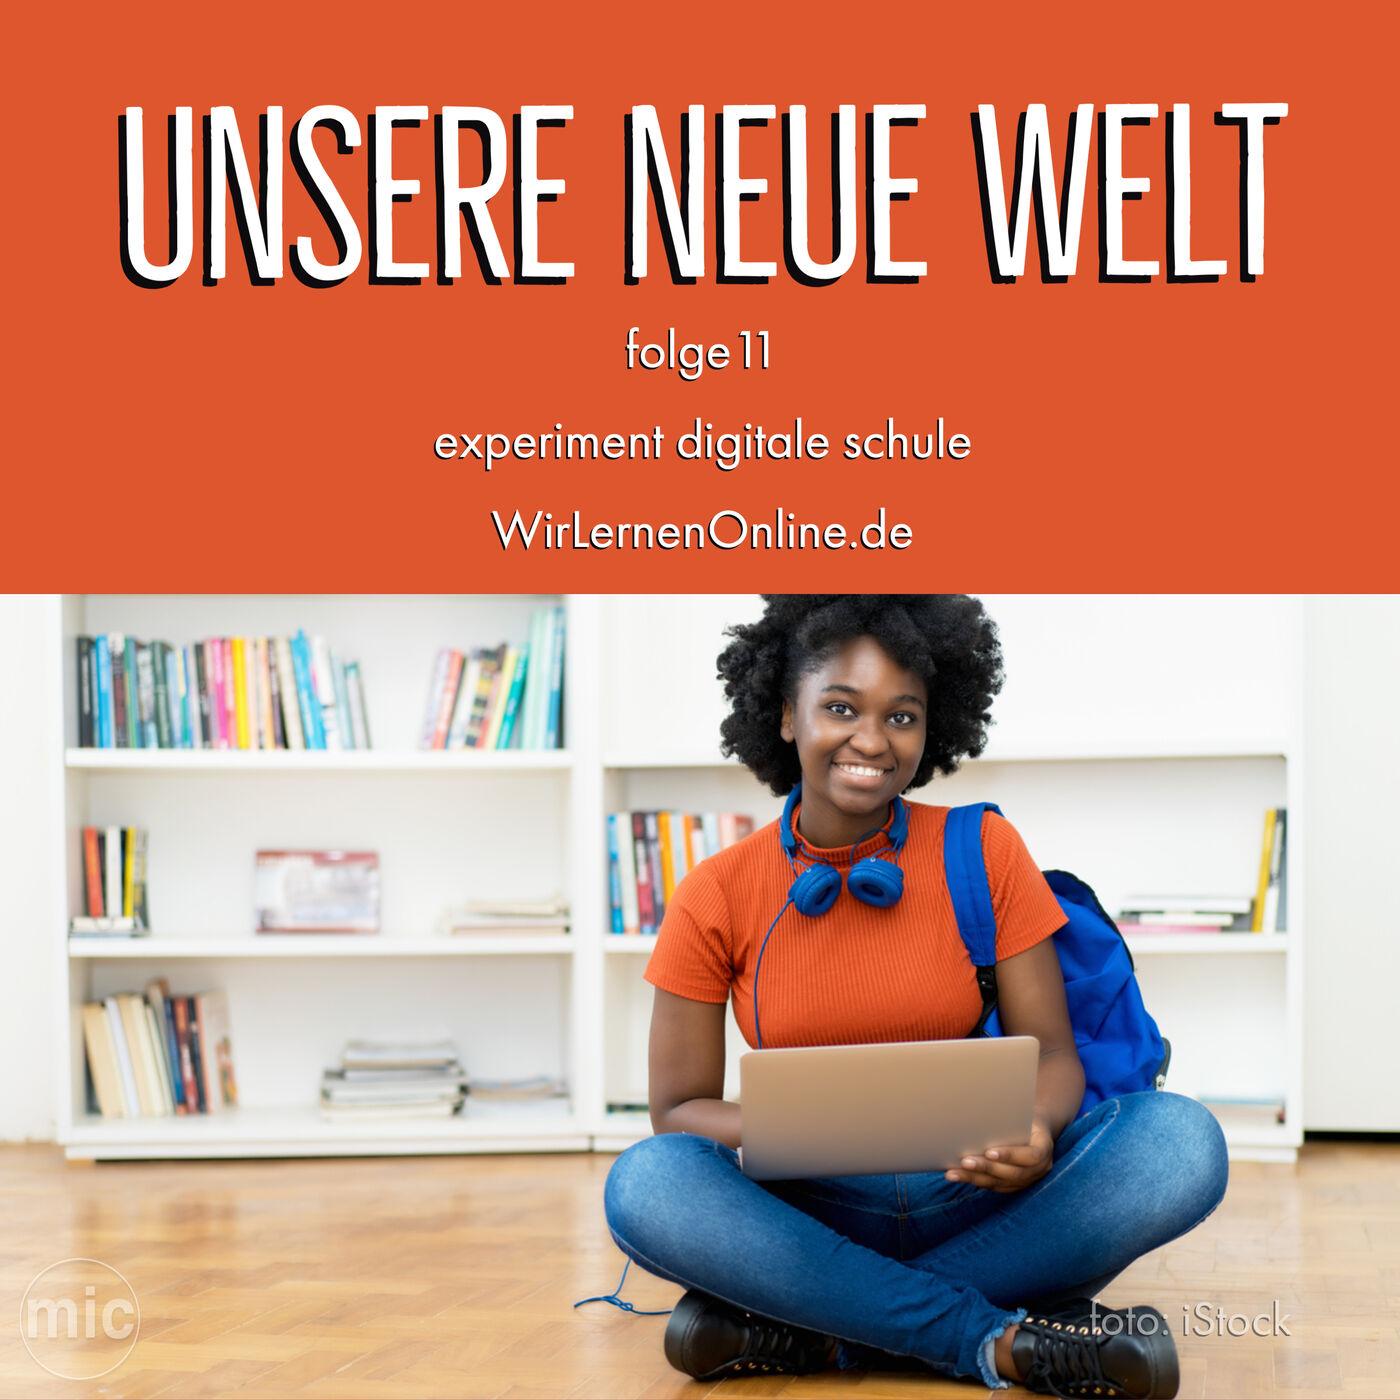 experiment digitale schule - WirLernenOnline.de